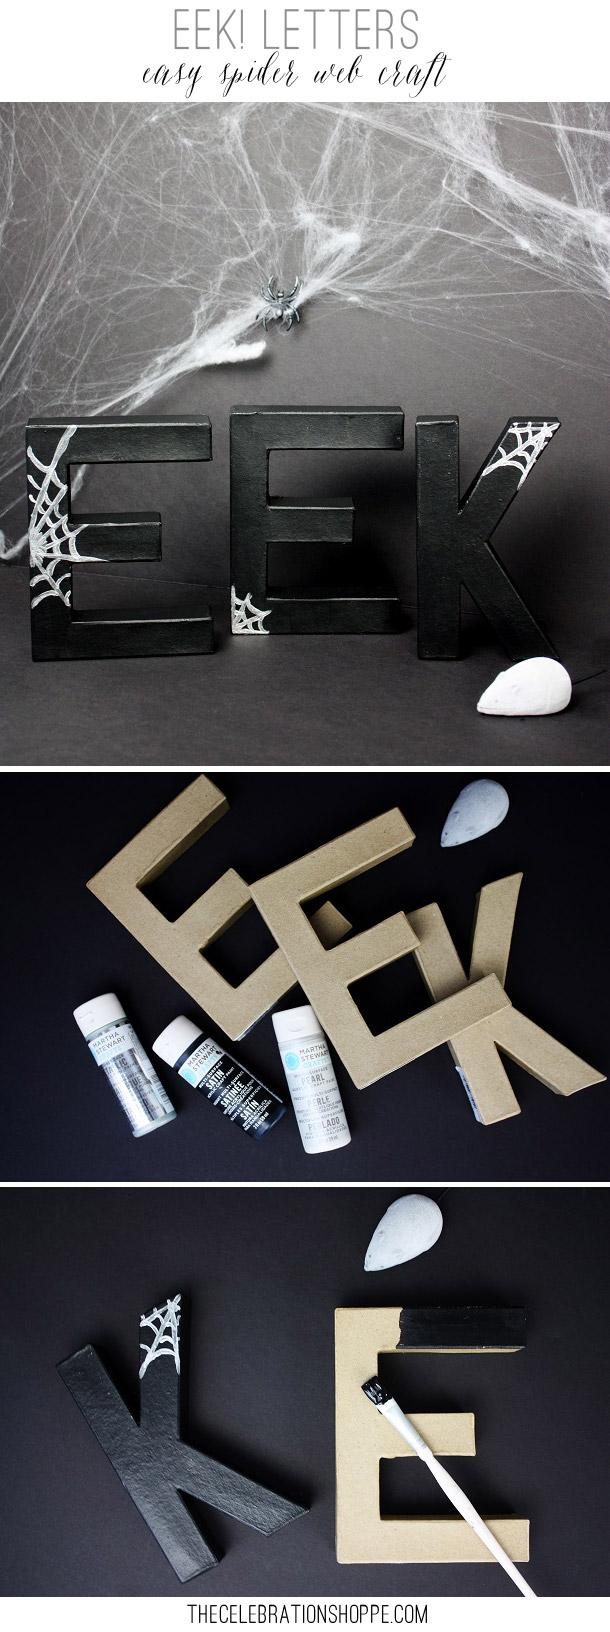 EEK Spiderweb Letters | Kim Byers, TheCelebrationShoppe.com